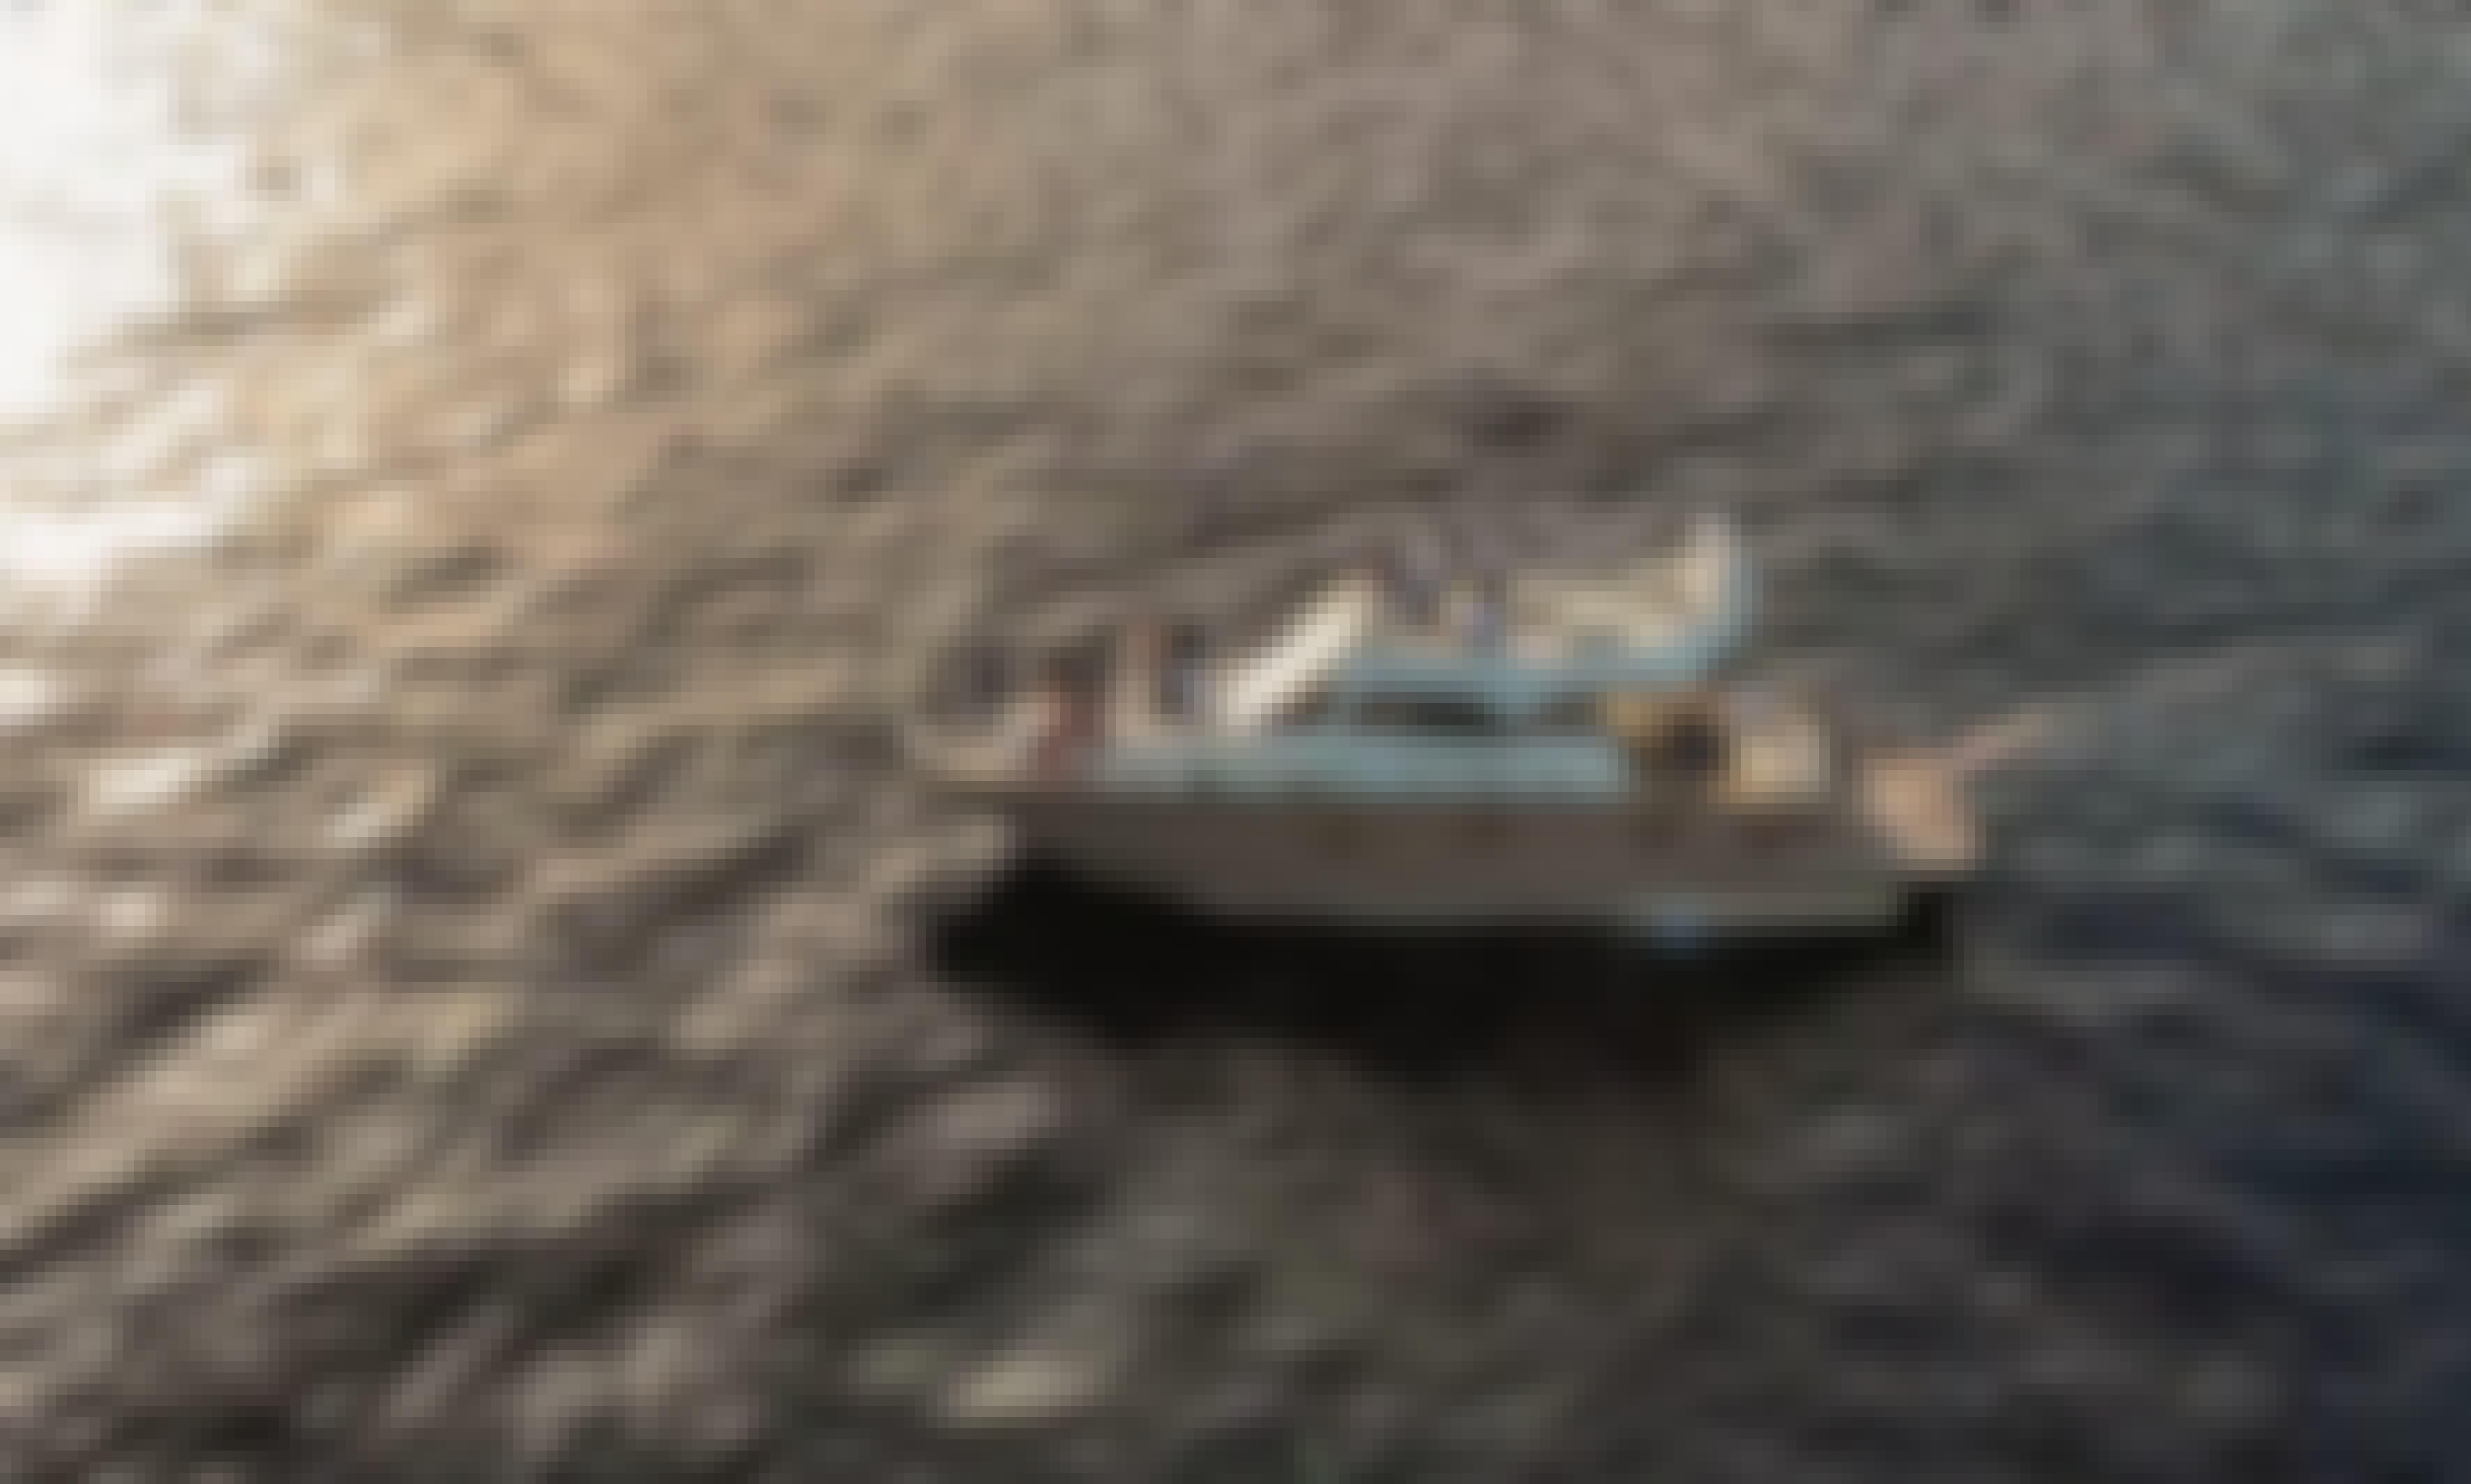 Crewed Charter Pietramarina Fly 50 Motor Yacht from Castellammare di Stabia